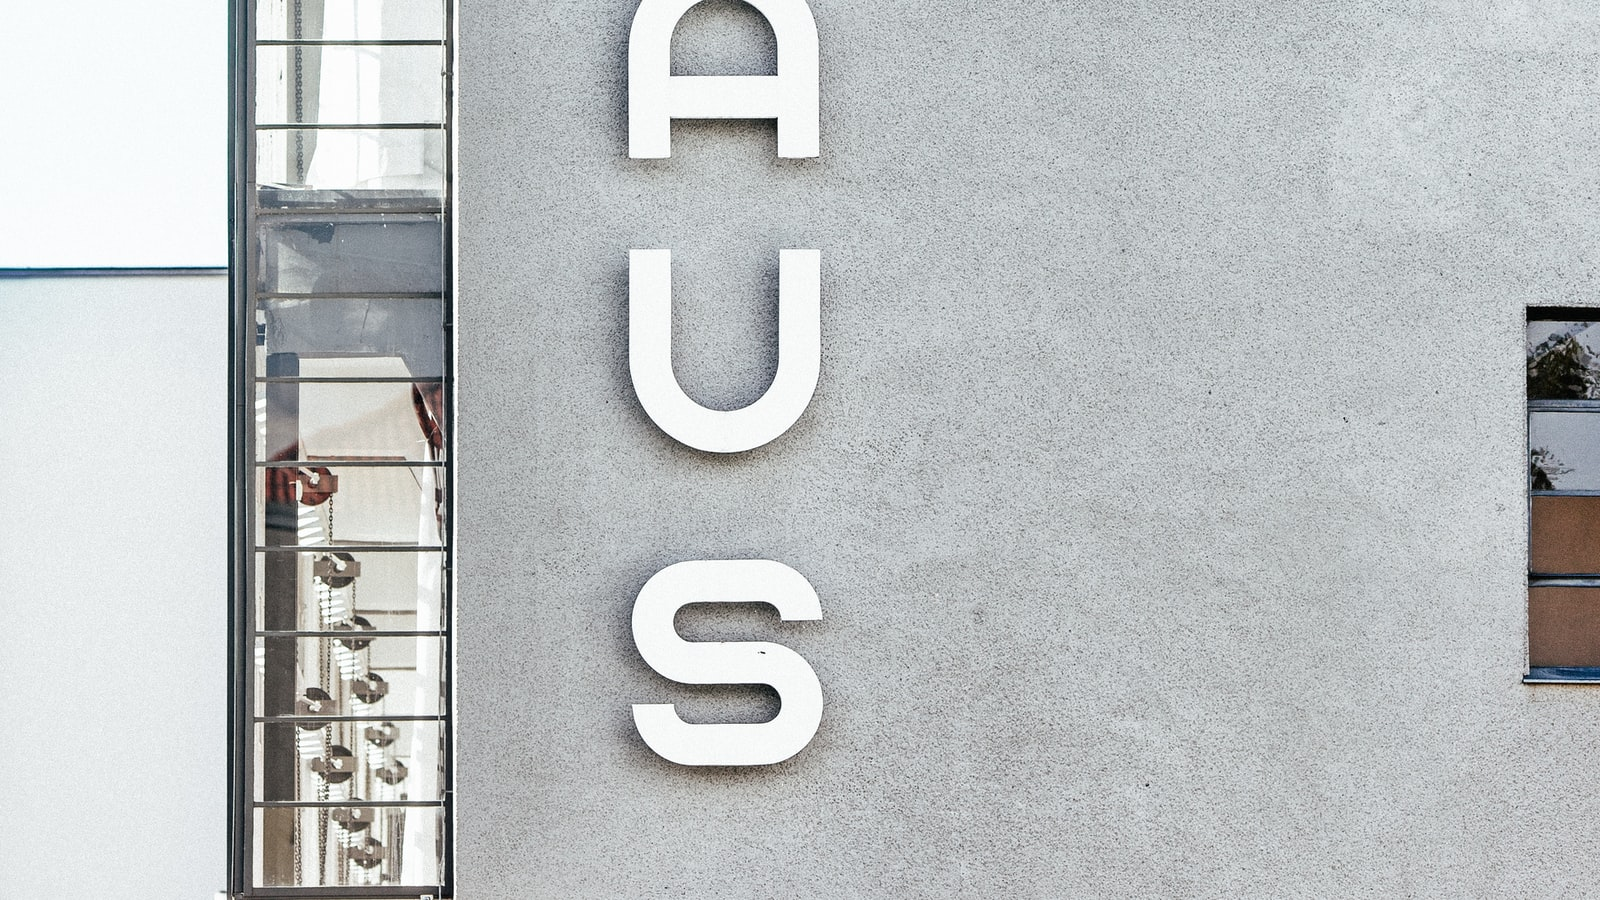 Bauhaus Building, Dessau